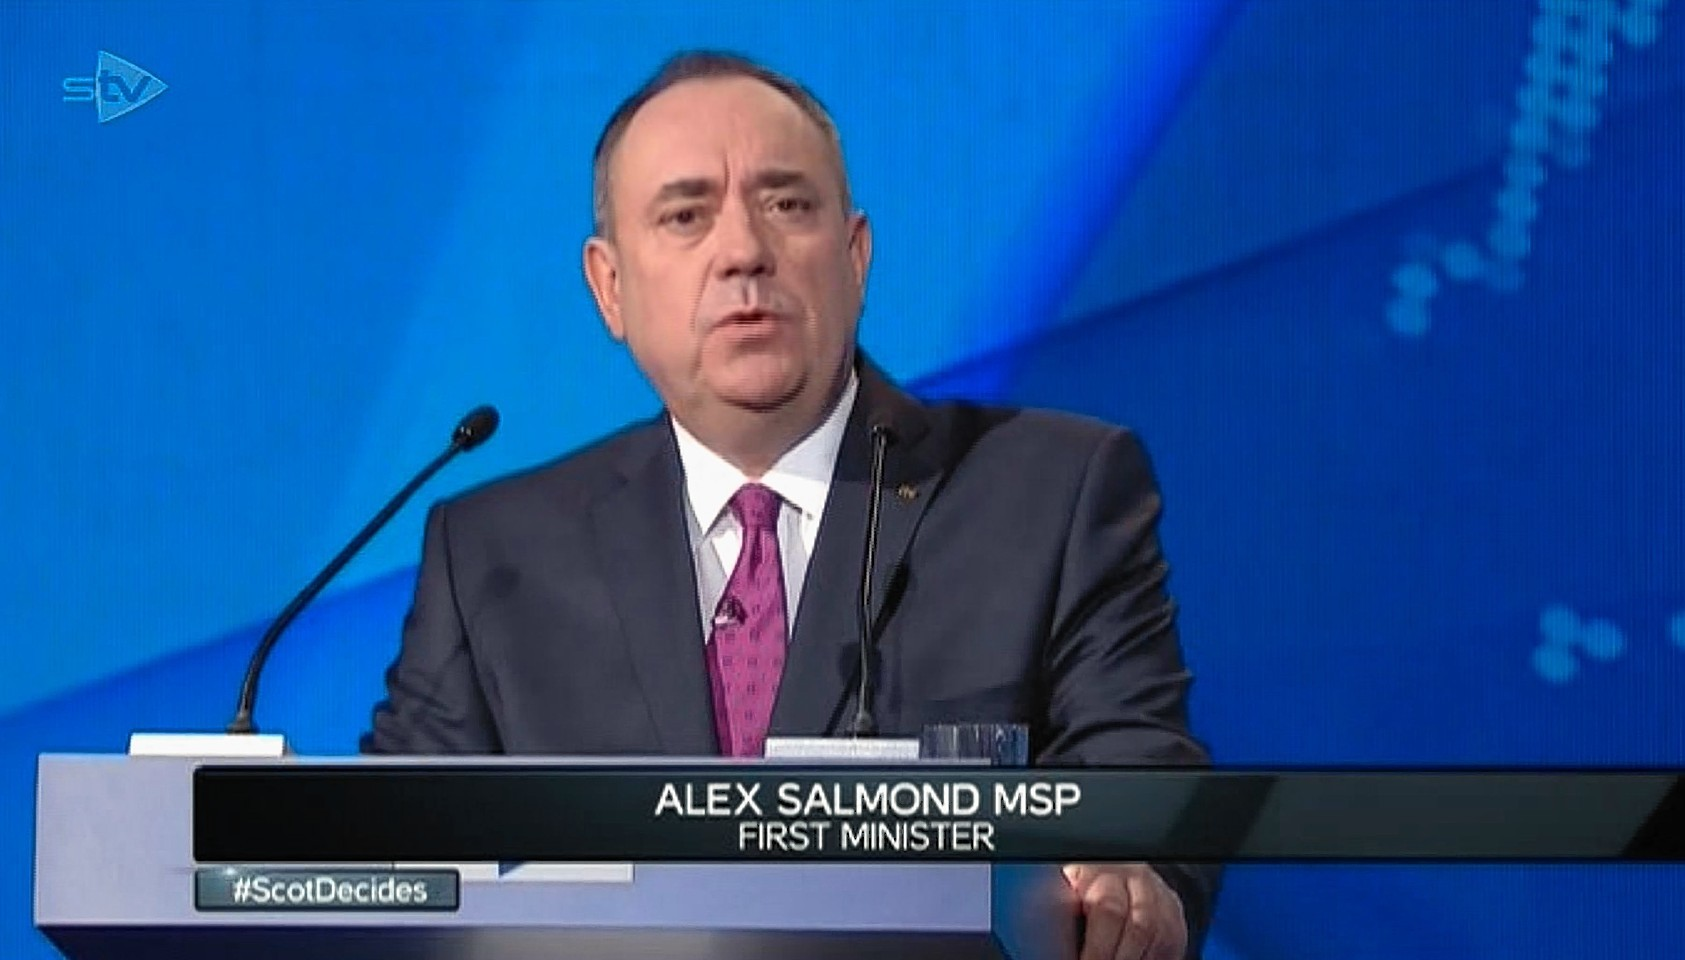 Alex Salmond at the debate